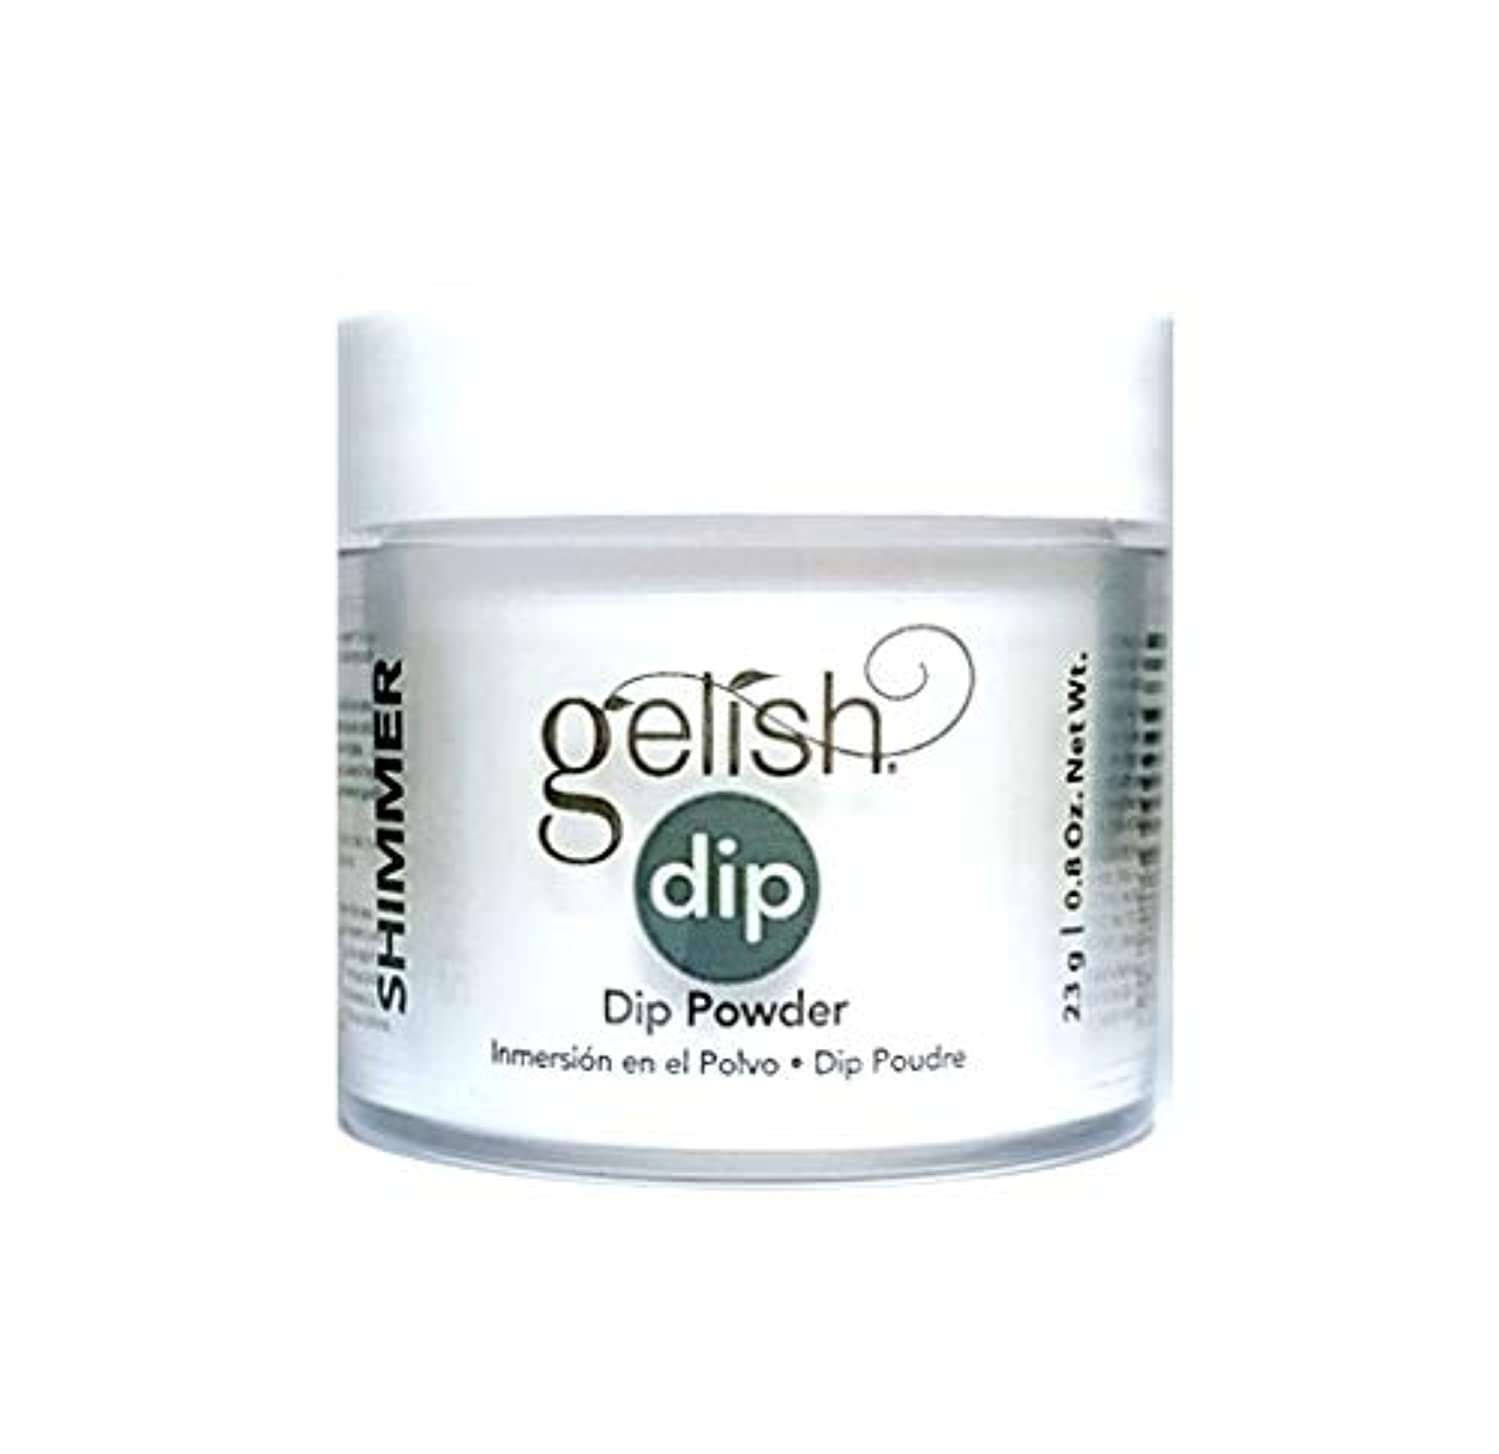 葉巻動的新着Harmony Gelish - Dip Powder - Izzy Wizzy, Let's Get Busy - 23g / 0.8oz